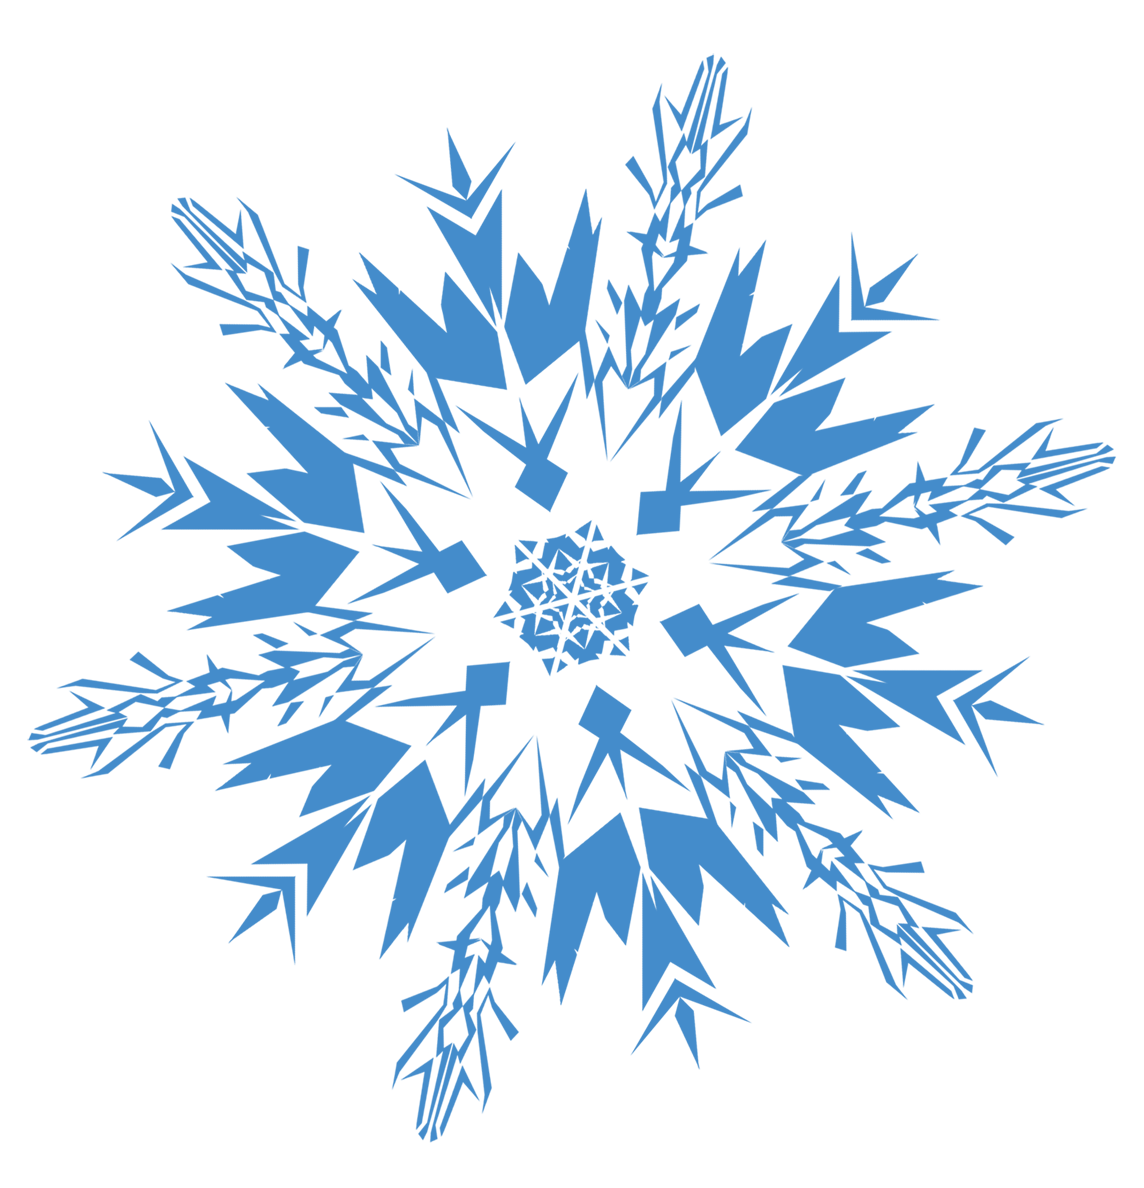 Snowflake Png Image Snowflake Png Image Snowflake